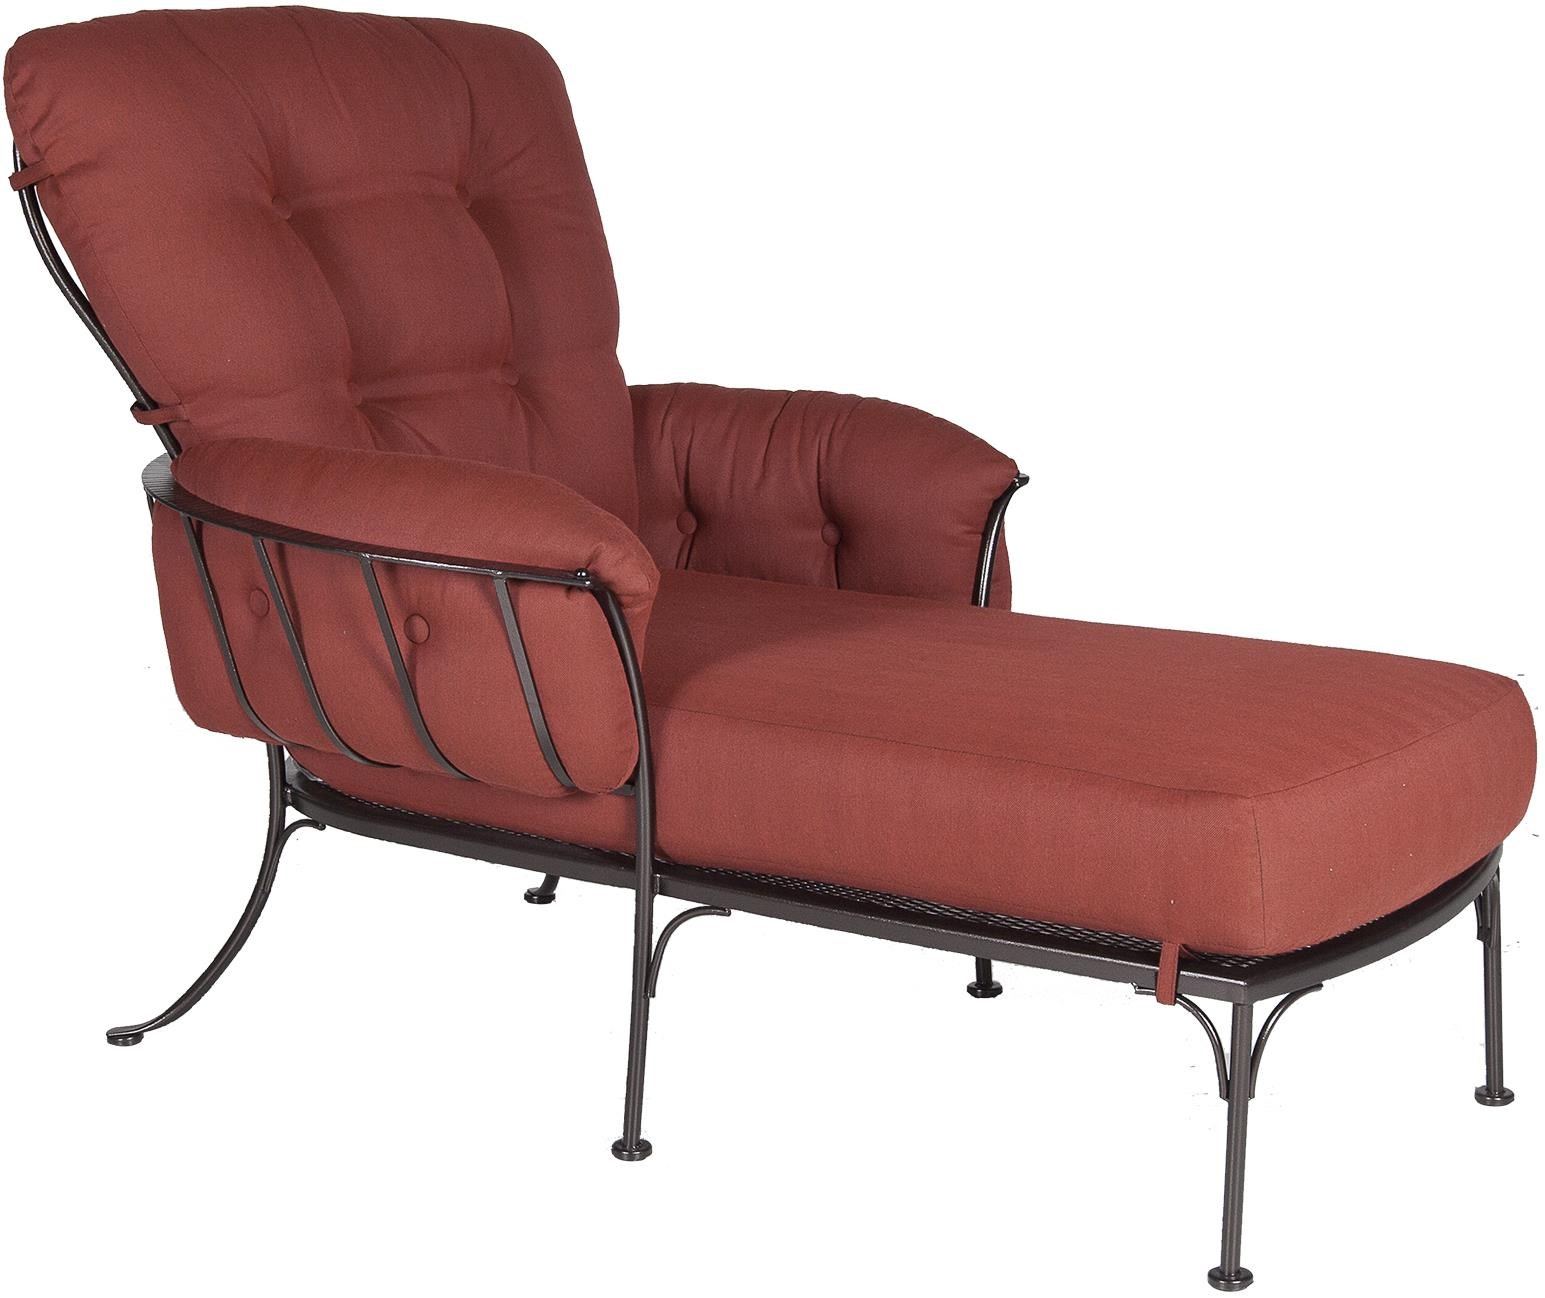 O.W. Lee Monterra Chaise